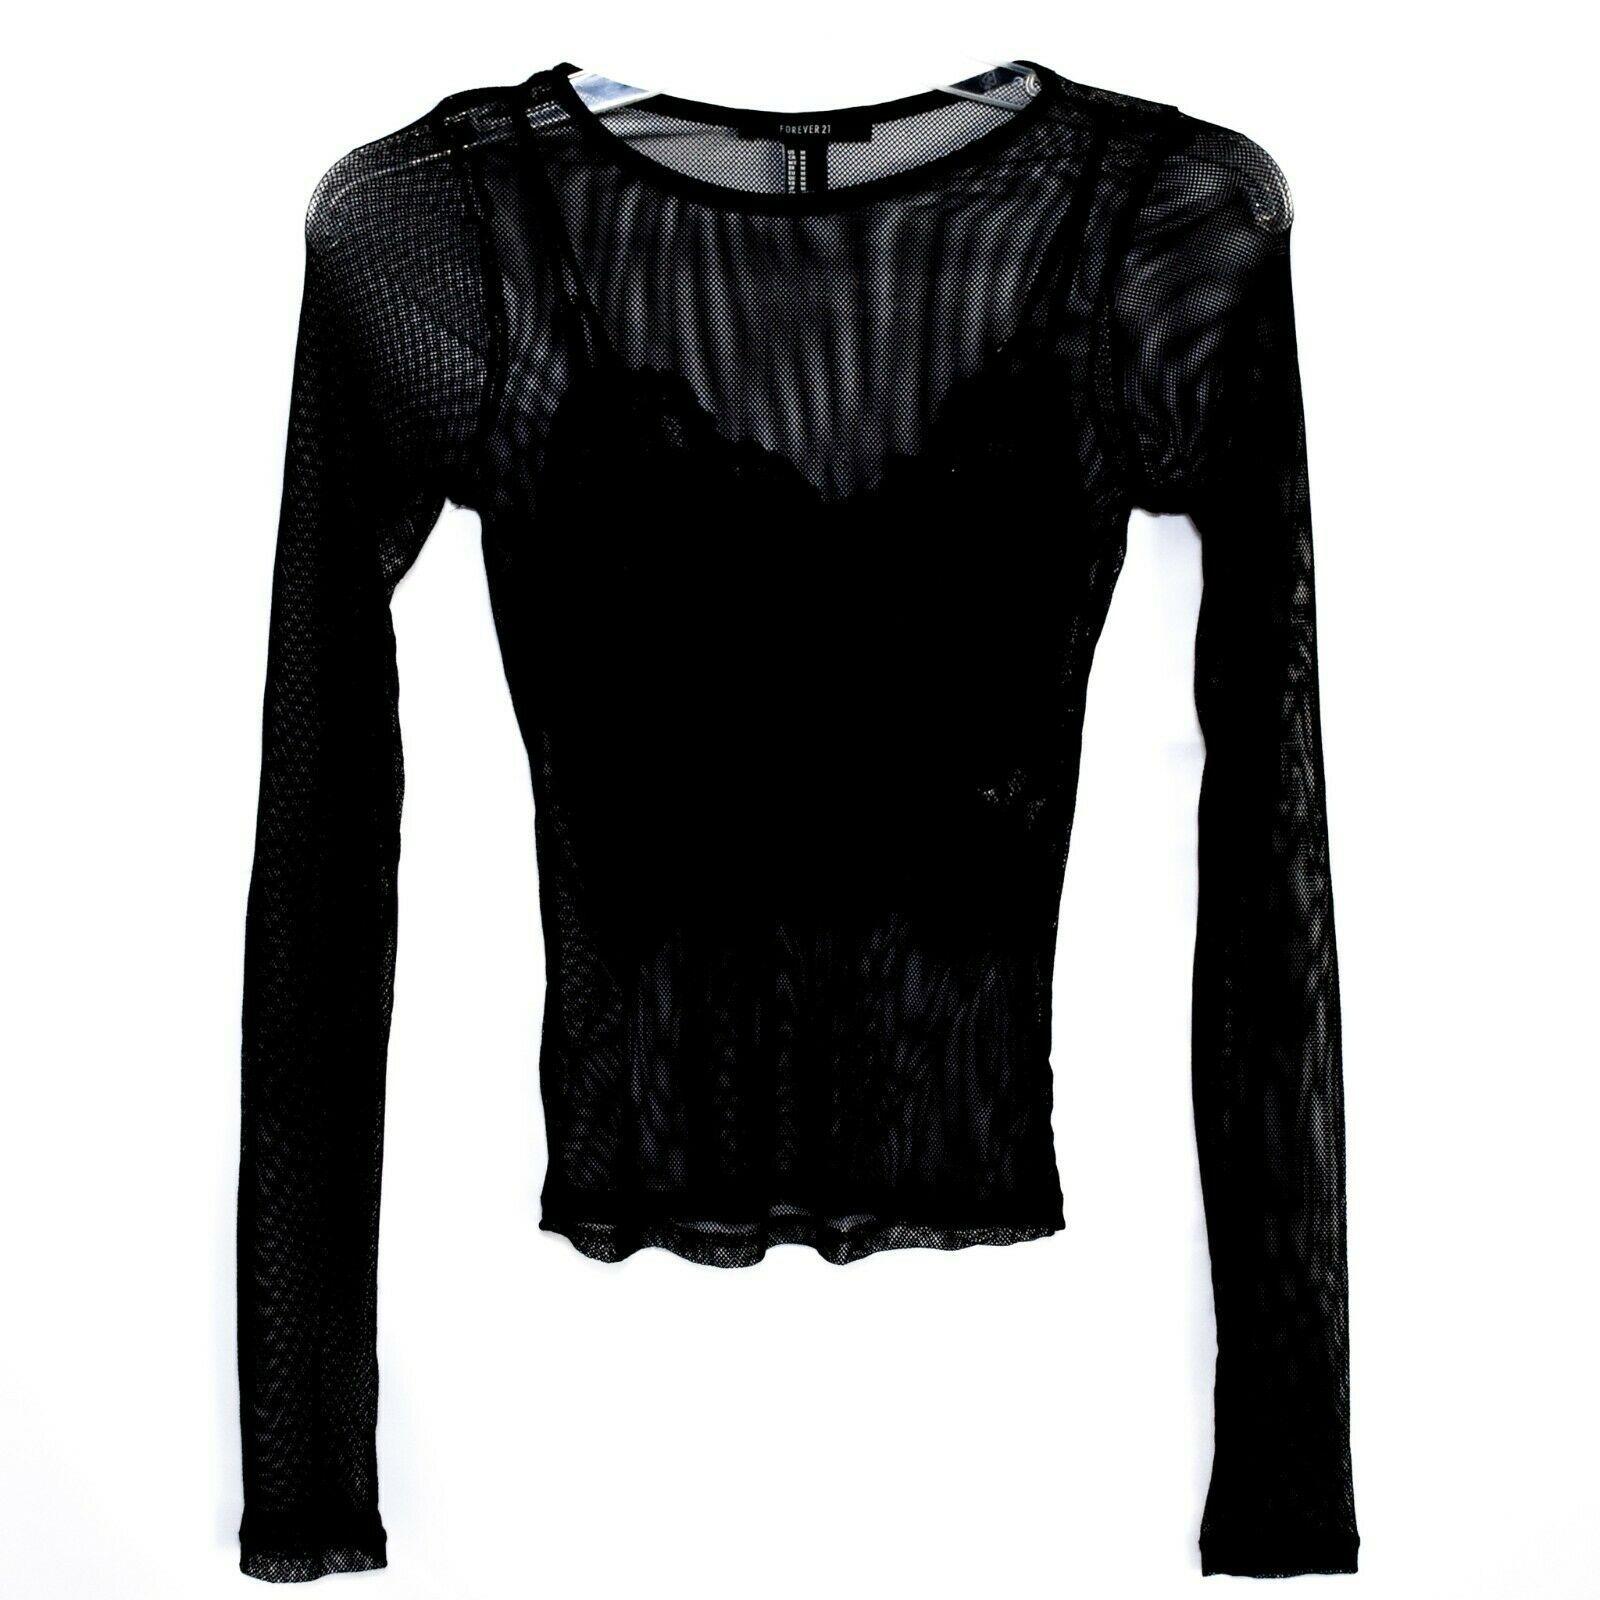 Forever 21 00211628 Women's 2-Part Mesh Long Sleeve Top w Lace Tank Insert Sz M